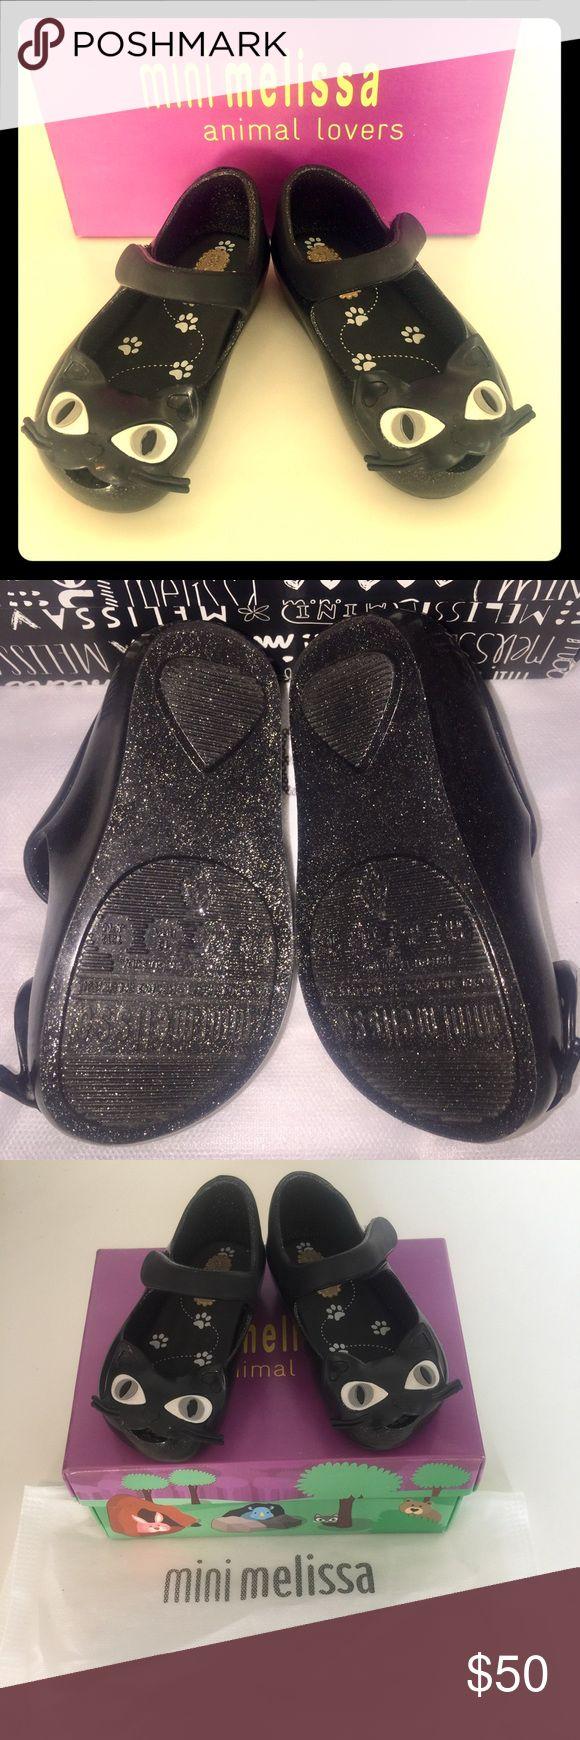 Mini Melissa Cat Shoes New with box! Black Glitter ✨ Purrrfection! Mini Melissa Shoes Dress Shoes